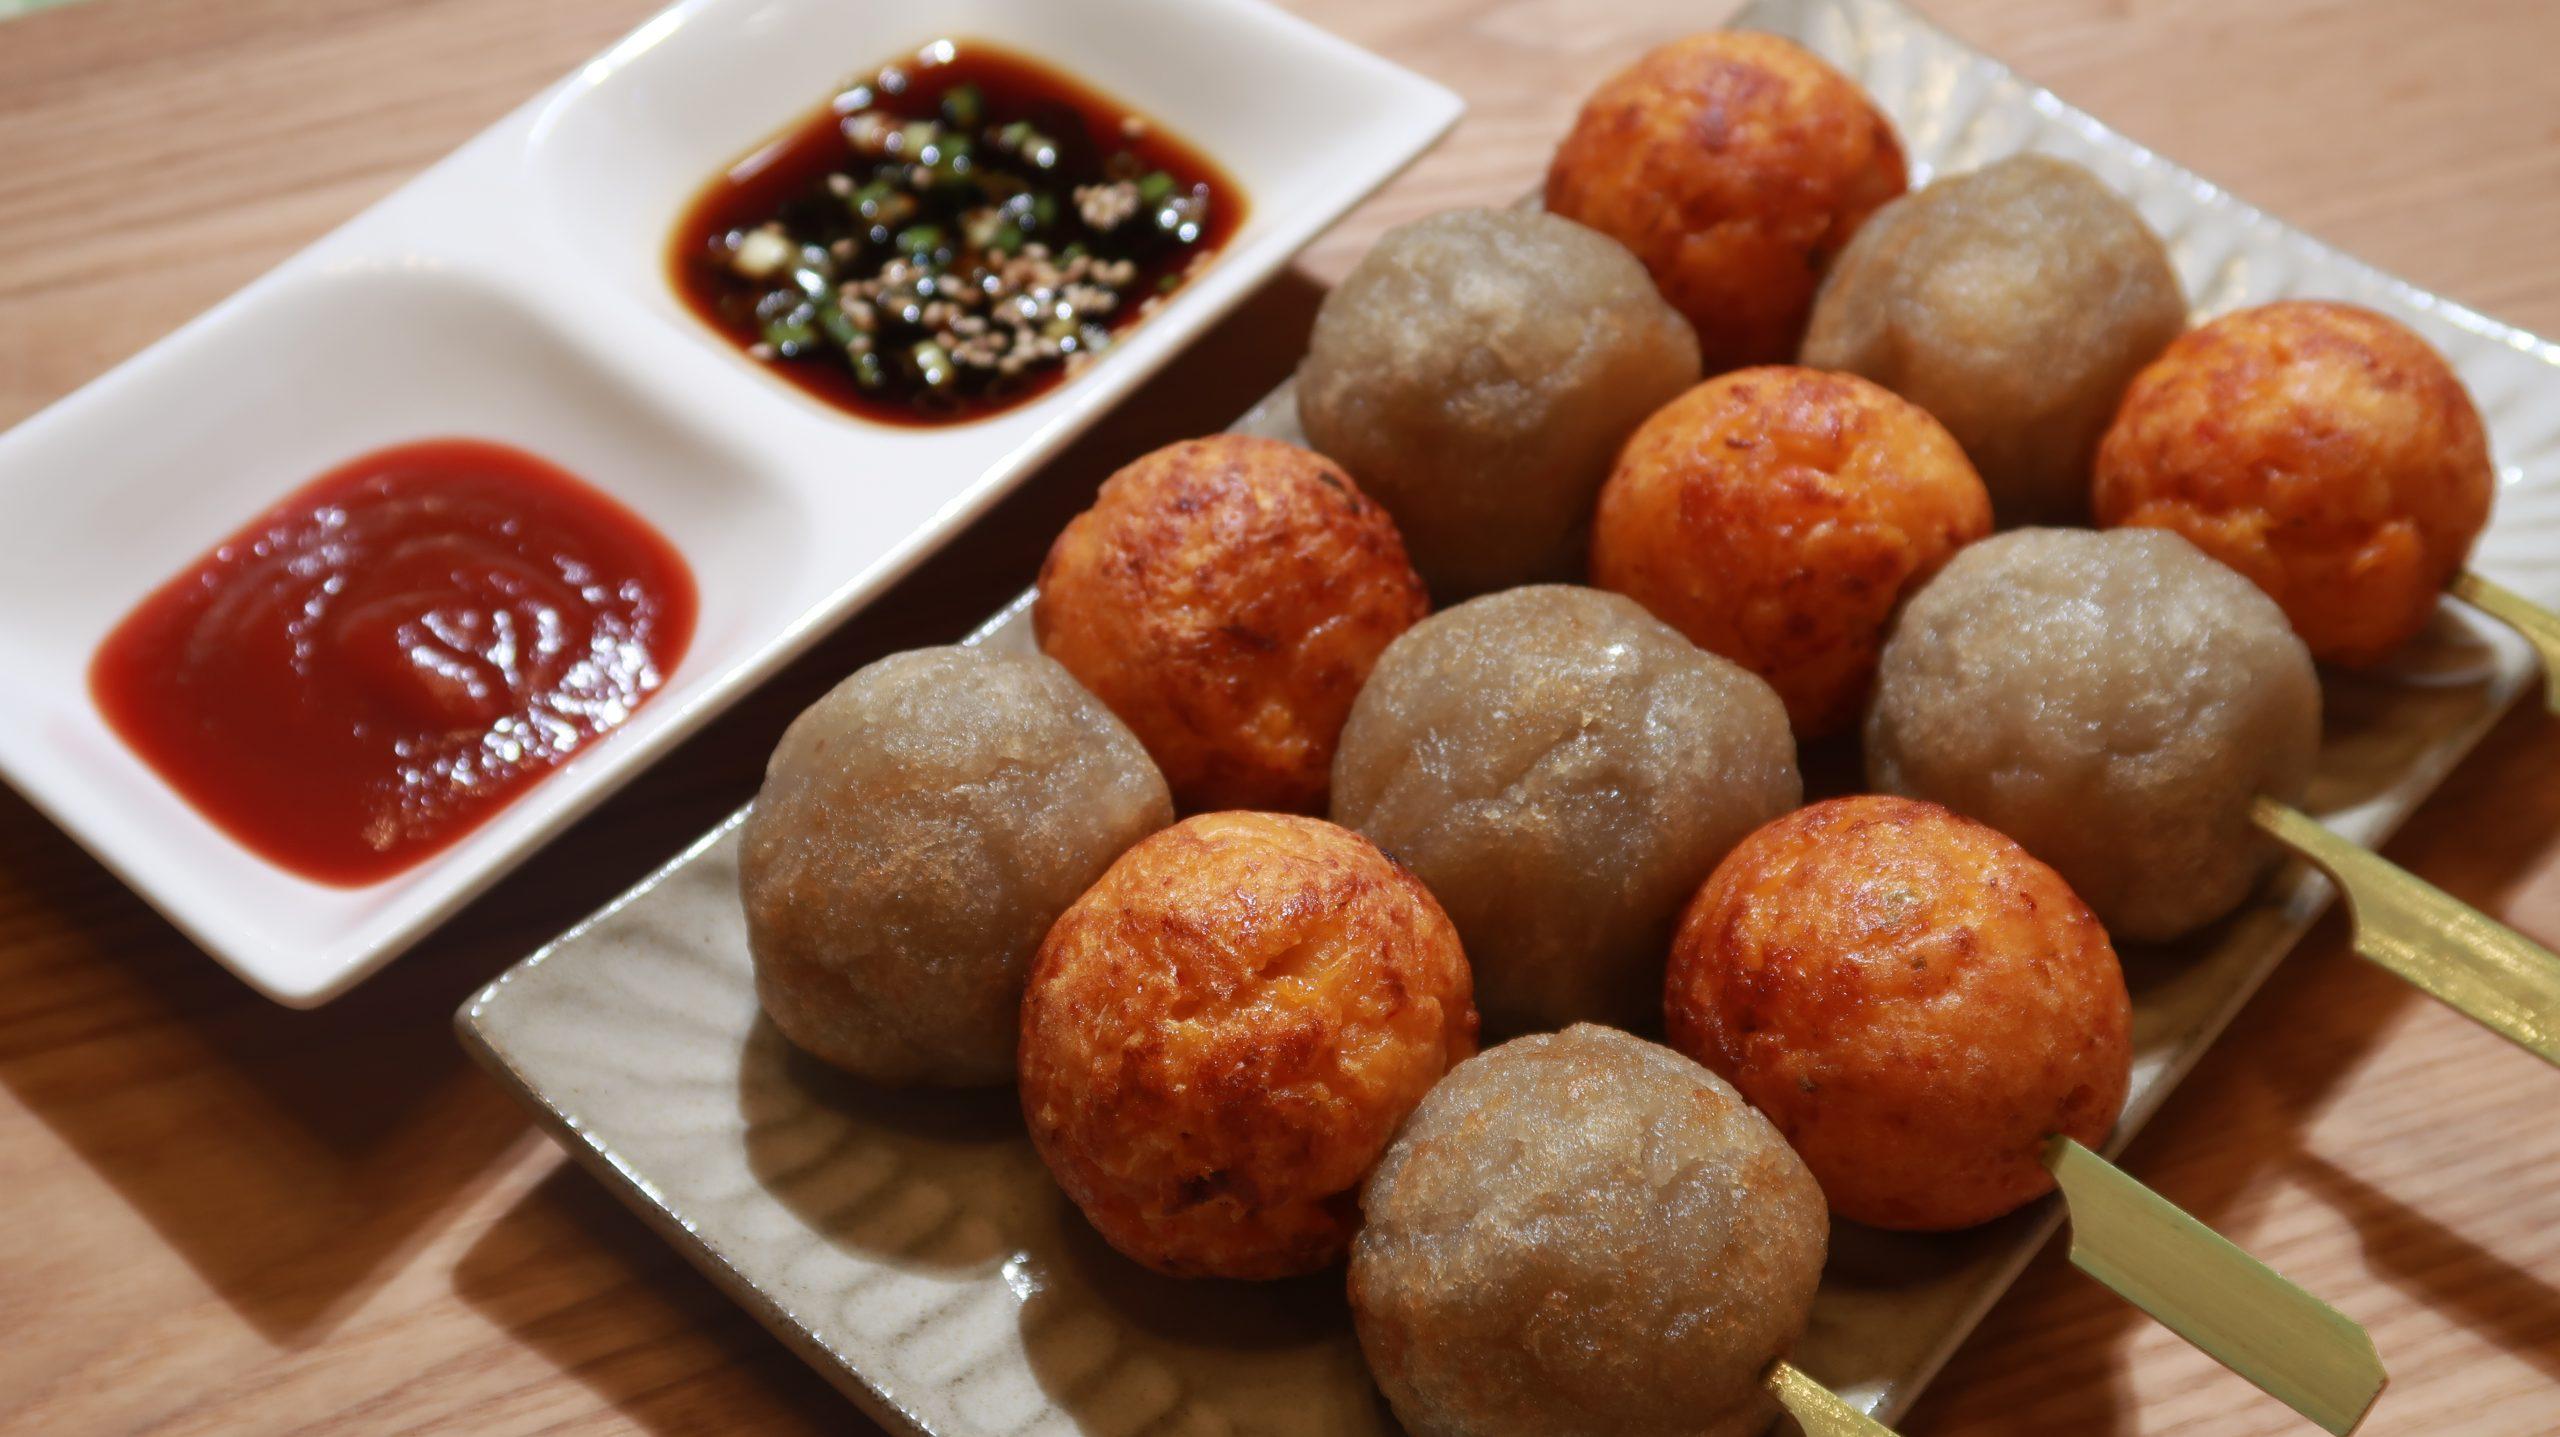 Olive家の簡単レシピ | 韓国料理応用 たこ焼き器で焼き上げるキムチチヂミ&ジャガイモチヂミ たこ焼き風